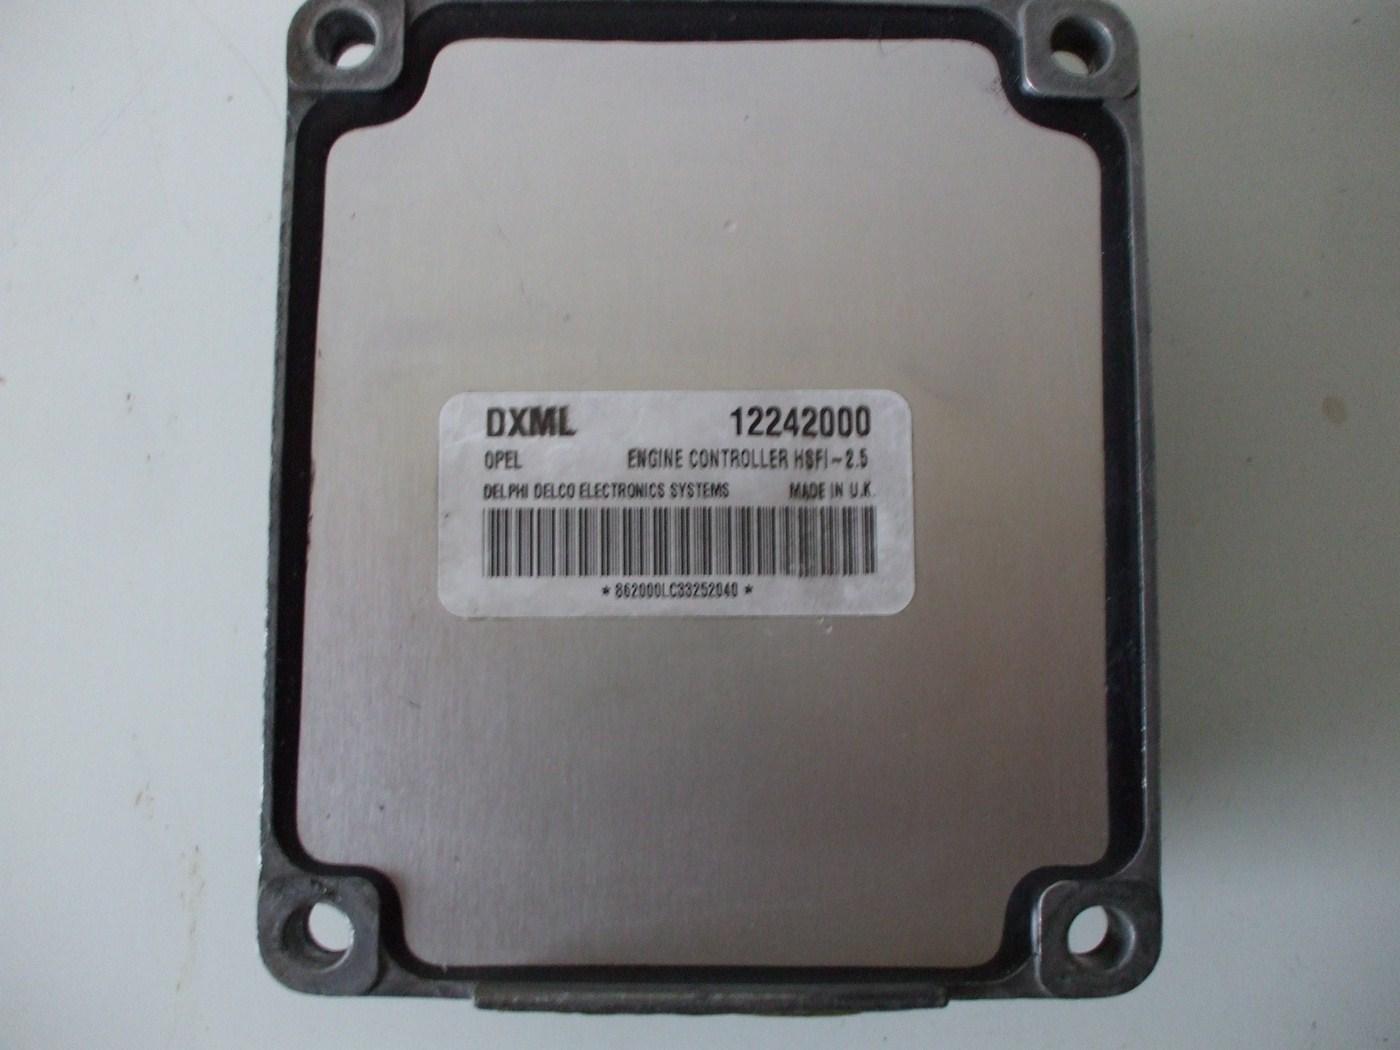 opel meriva 1 6 компьютер 12242000 dxml выход